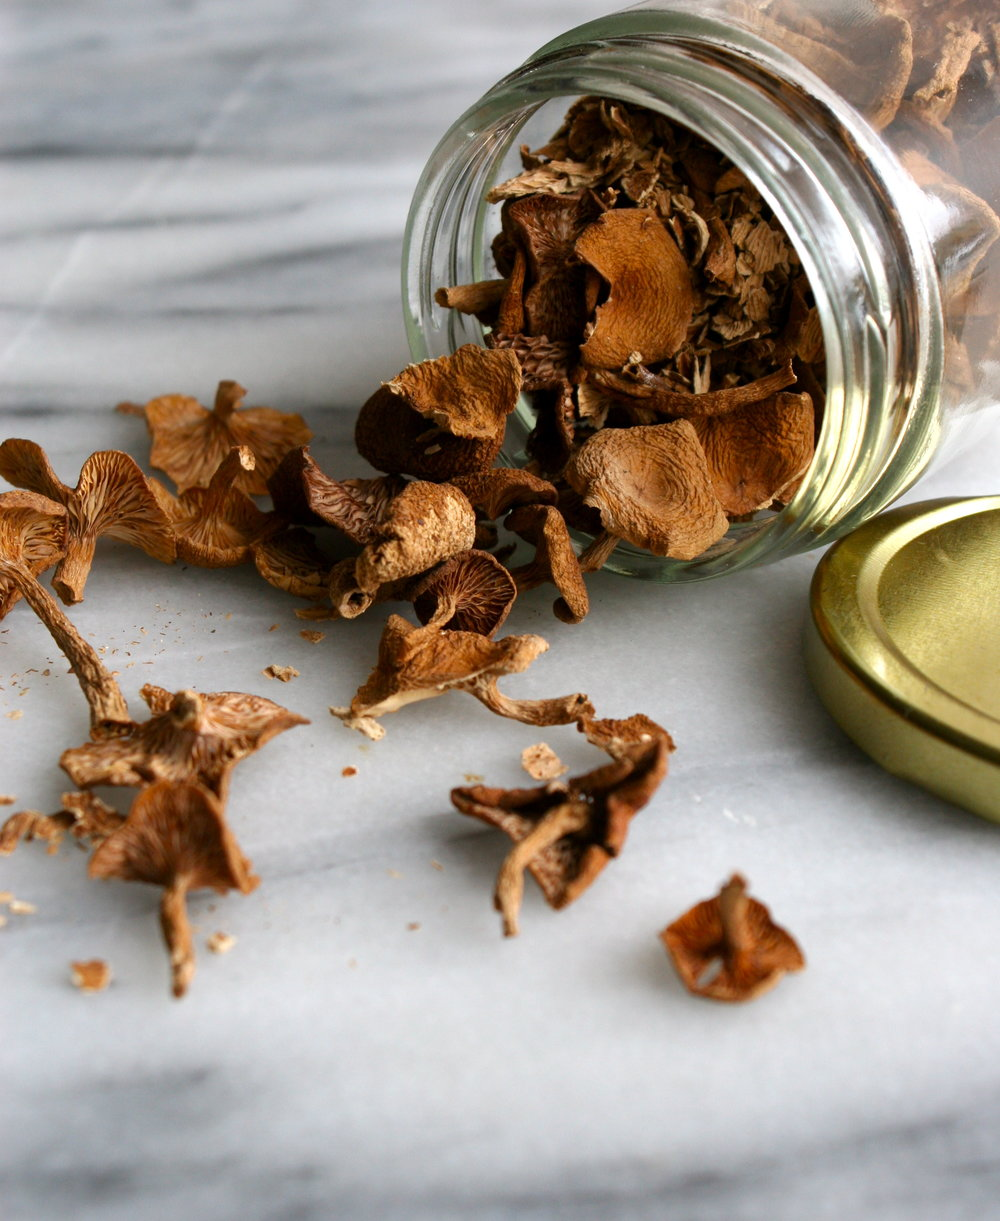 Candy Cap Mushroom Recipe Ideas - dried candy cap mushroom image